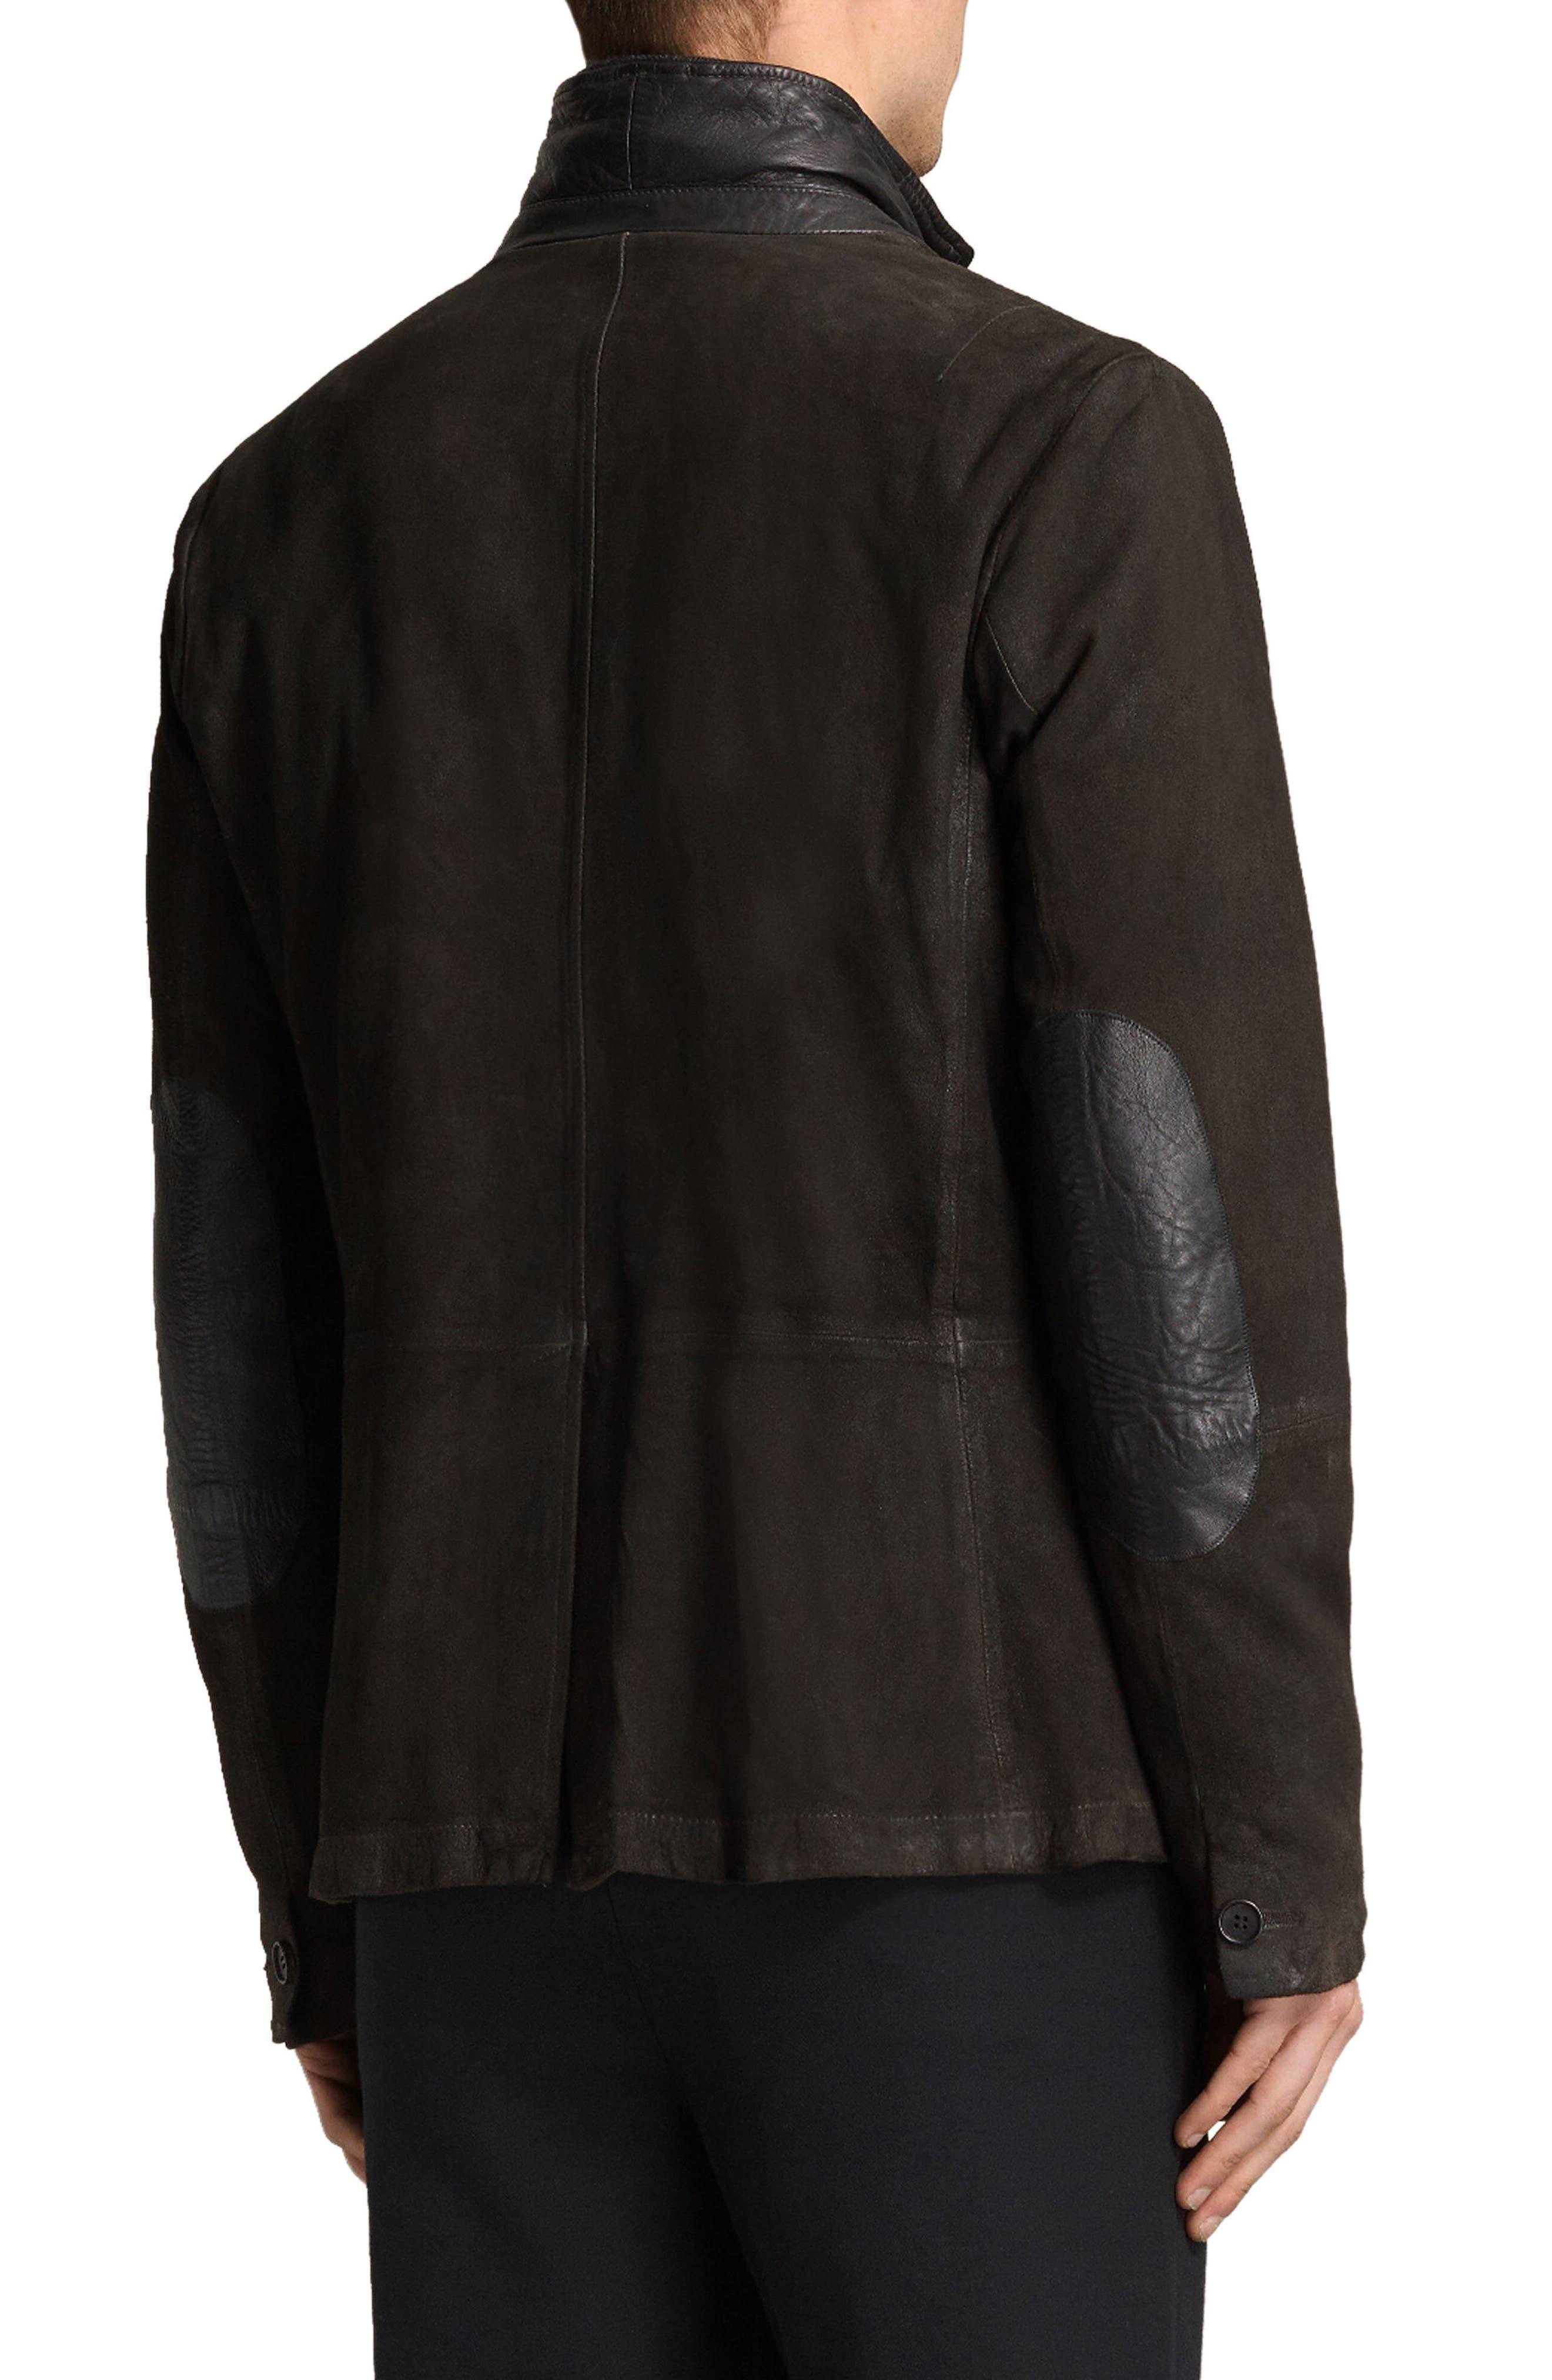 Survey Leather Blazer,                             Alternate thumbnail 2, color,                             Anthracite Grey